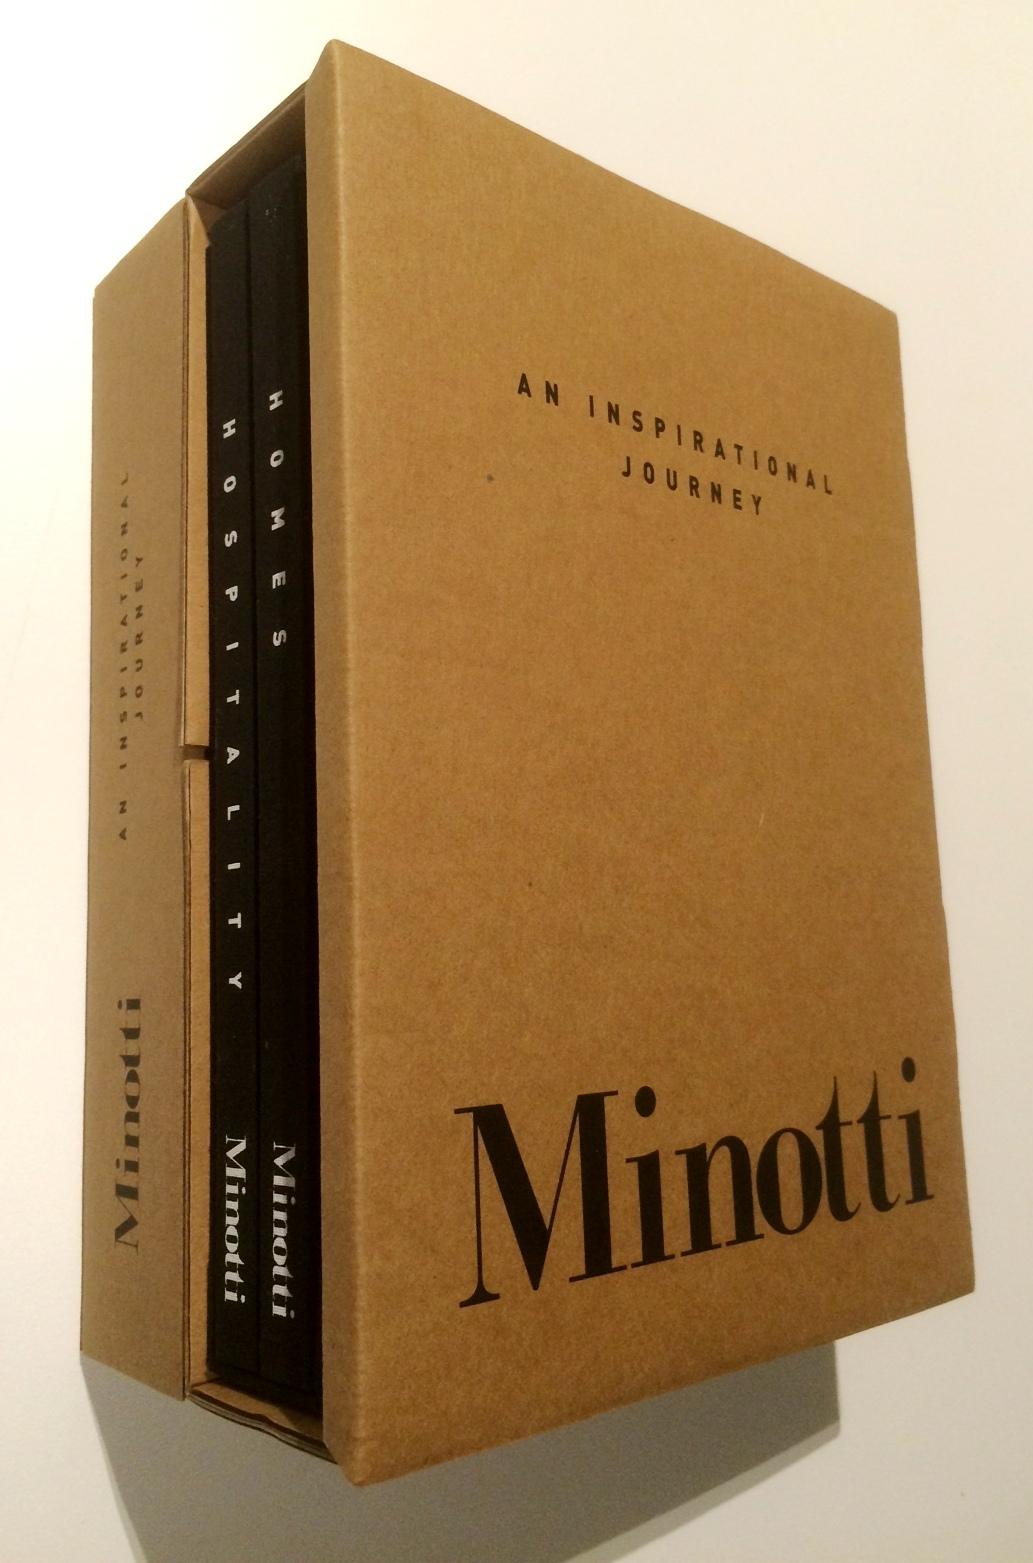 minotti inspirational journey books